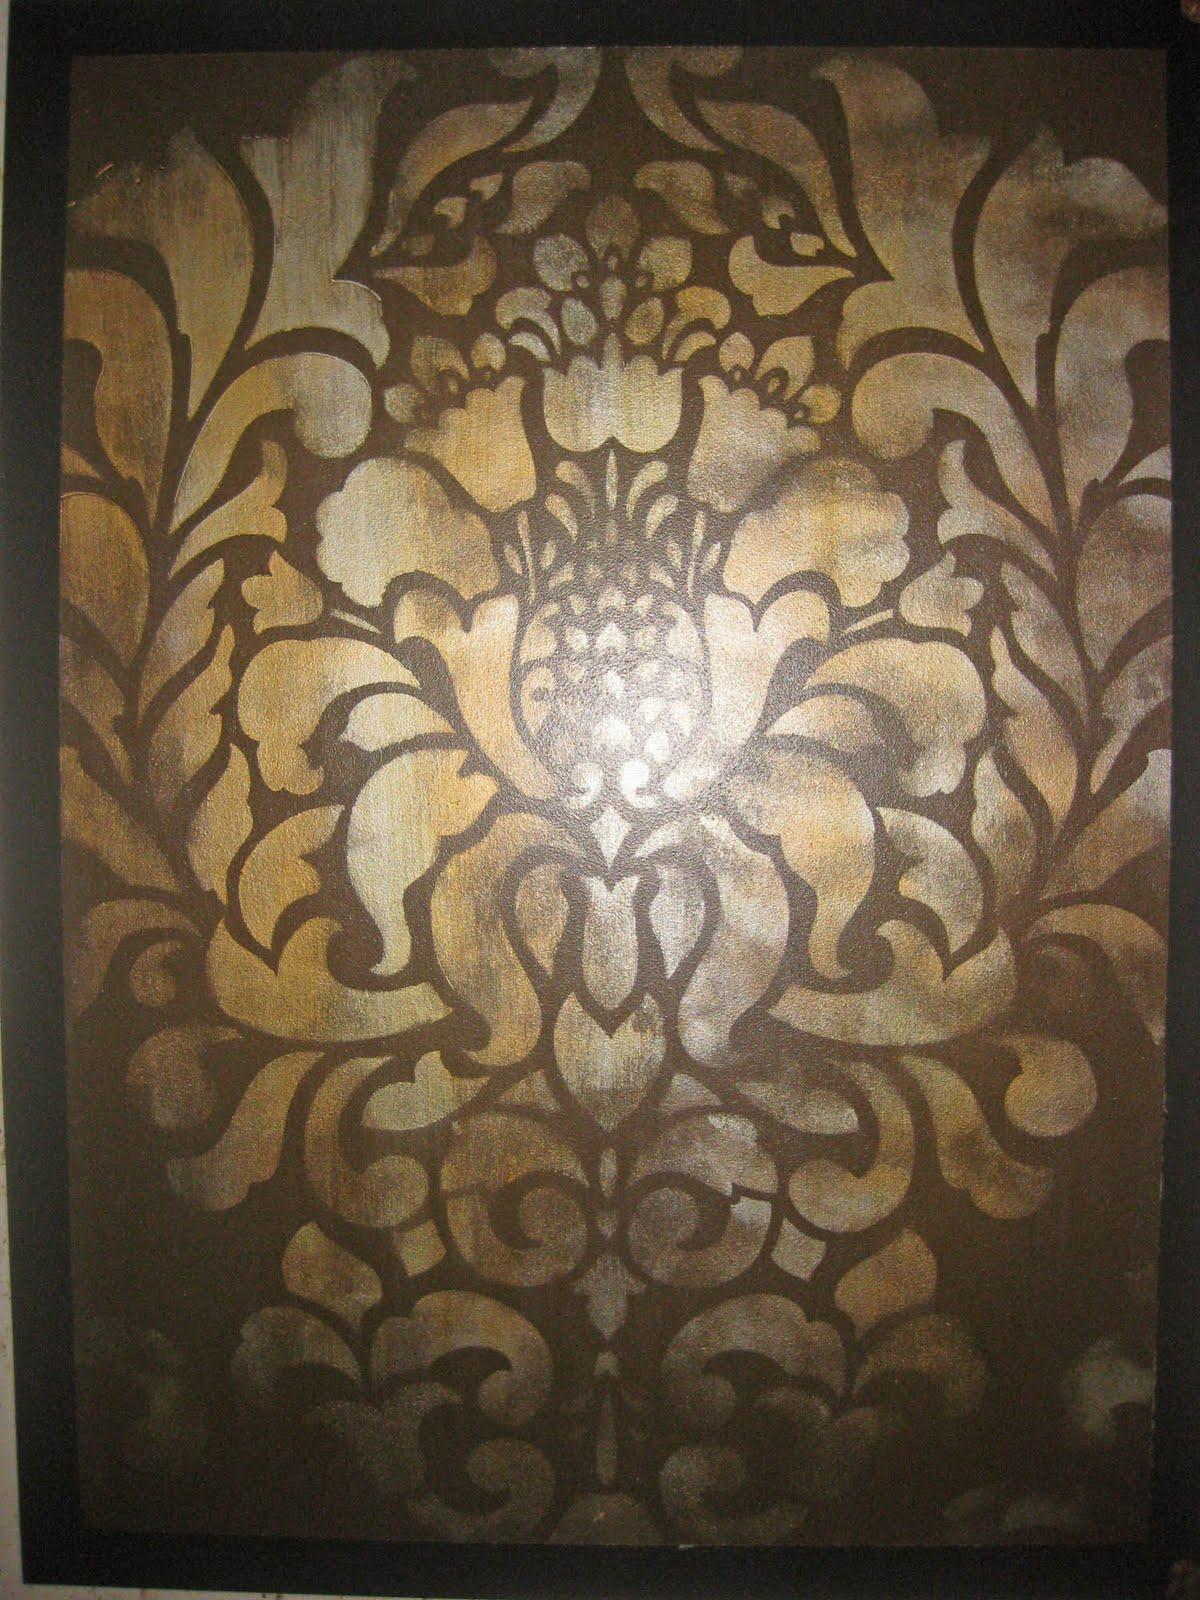 http://2.bp.blogspot.com/_LfAXthnifgA/TJkMSloI7VI/AAAAAAAAA0Q/SF4uBVw7Kxk/s1600/Silver+and+Brass+Damask.jpg